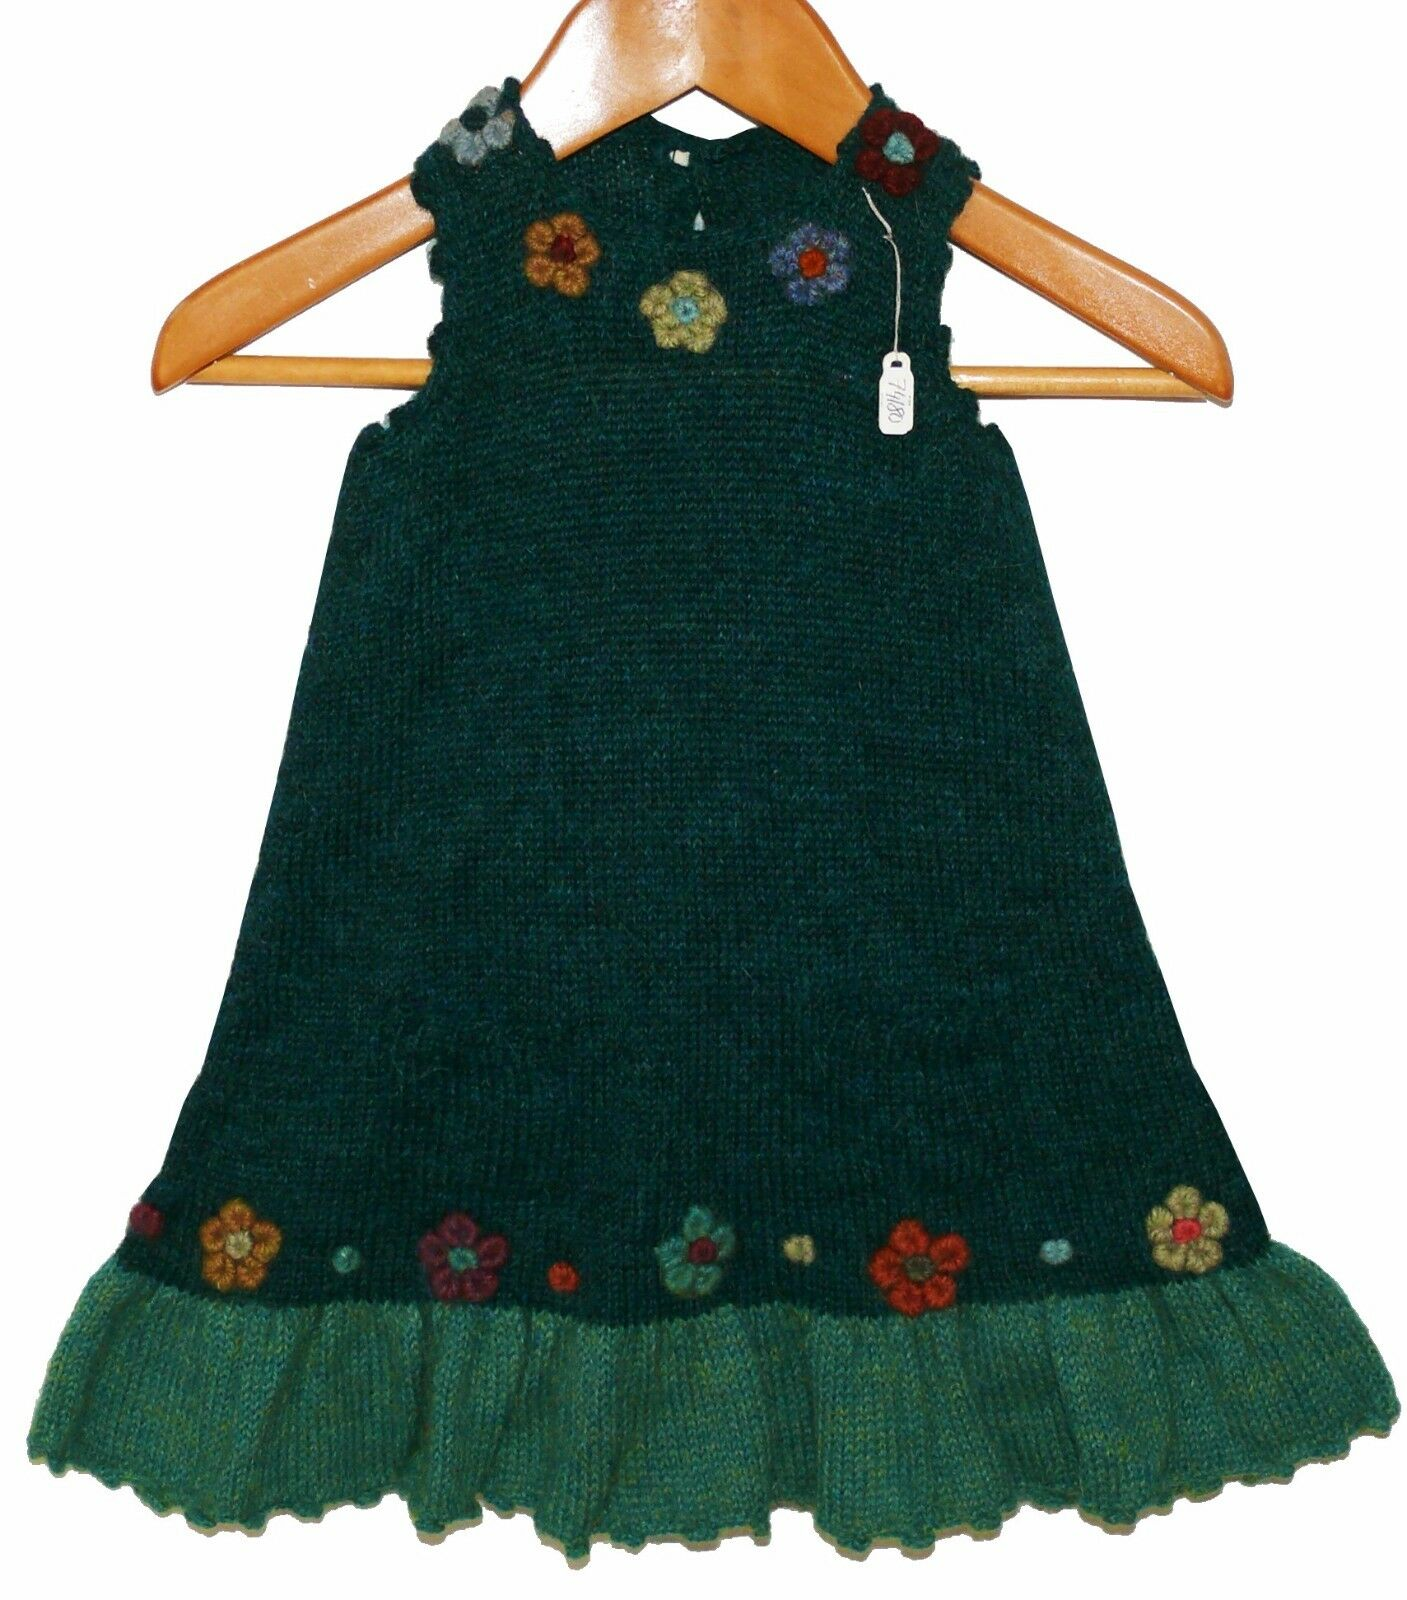 Baby Puppen Alpaka Kleid Blaumen, Gr.74 80, grün petrol, 100% Alpaca Wolle, Peru